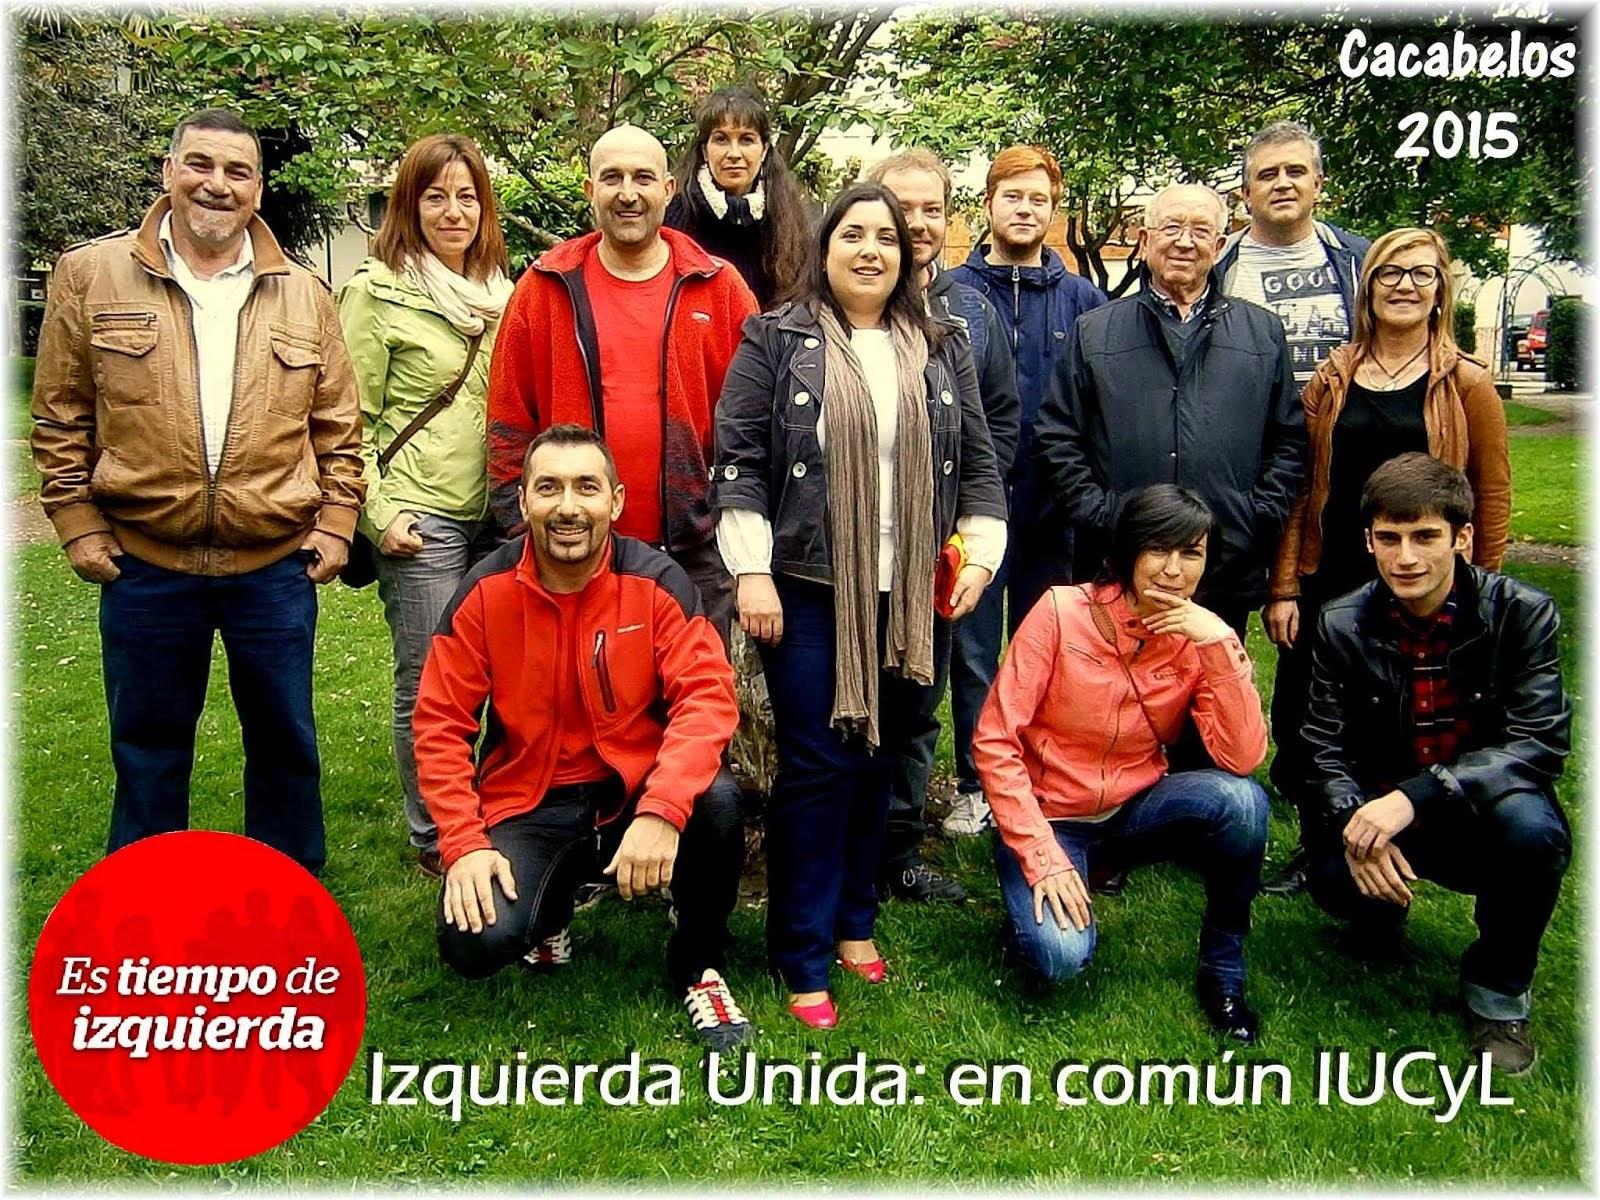 Candidatura IU Cacabelos 2015